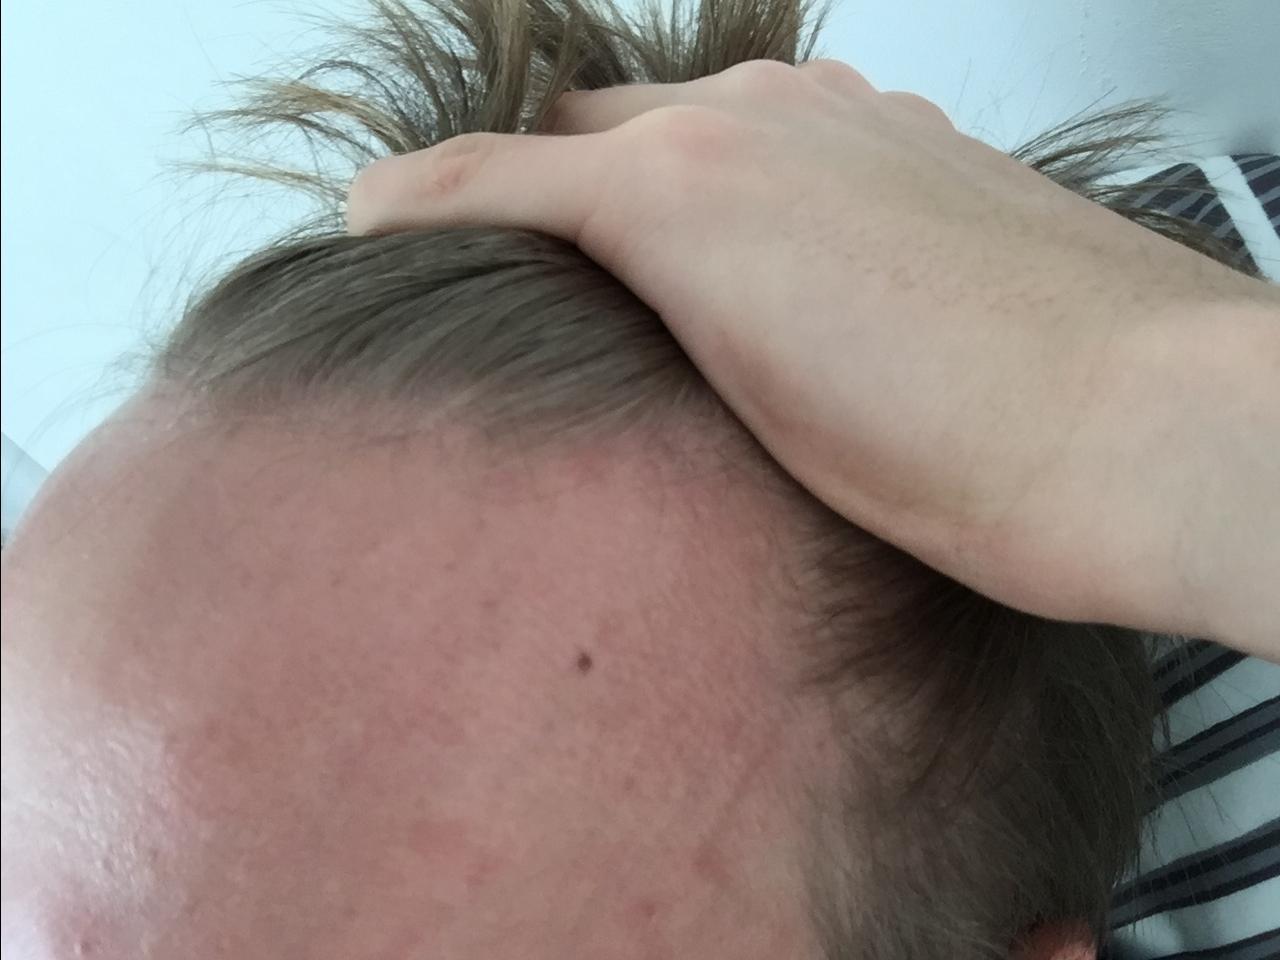 Das Haar prolabiert nicht nur auf dem Kopf sondern auch den ganzen Körper